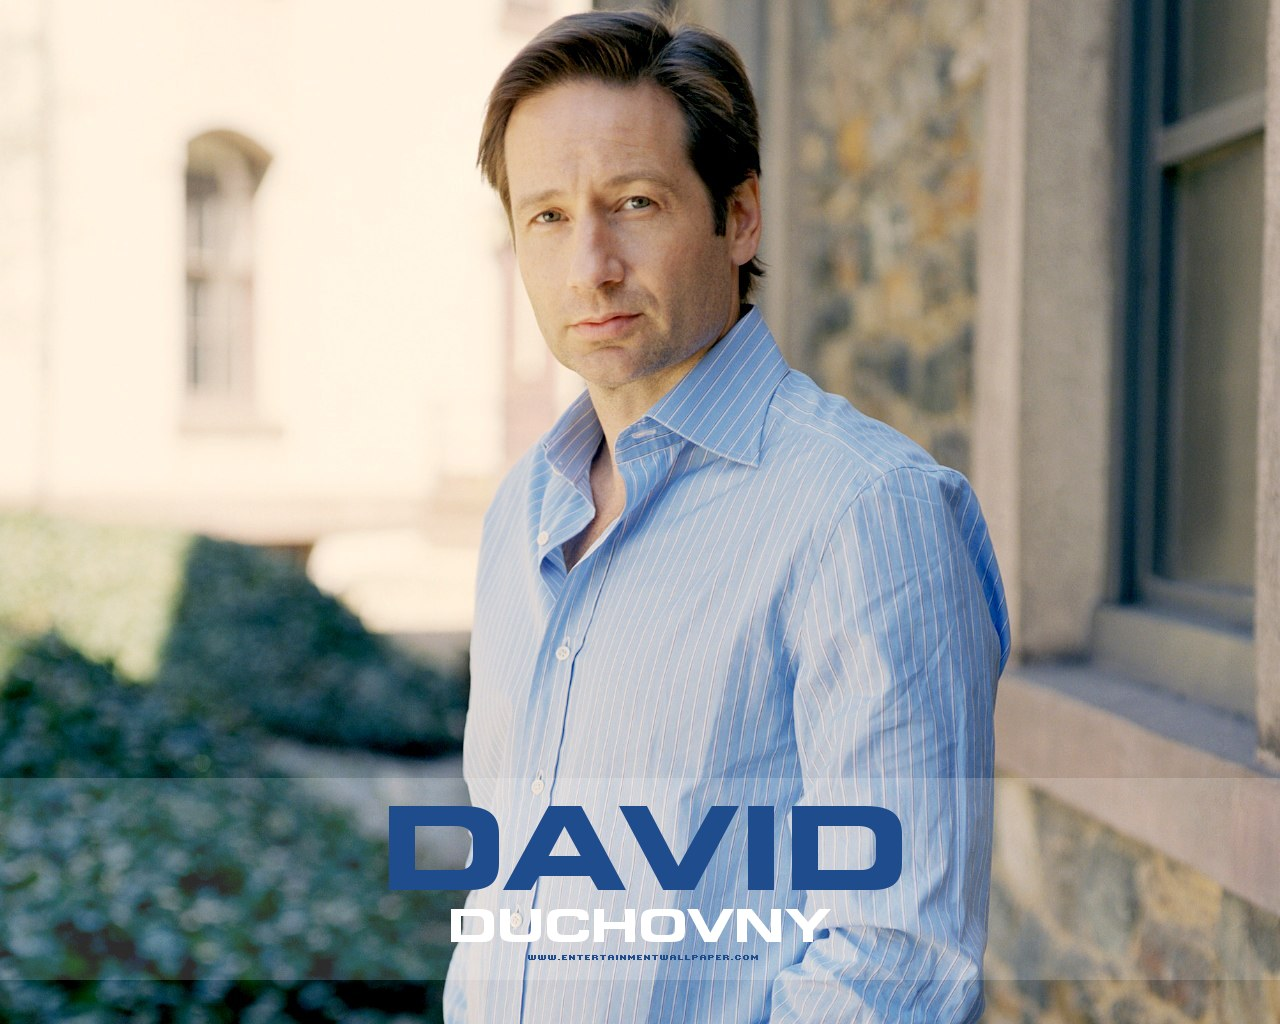 David Duchovny Wallpaper 15   1280 X 1024 stmednet 1280x1024